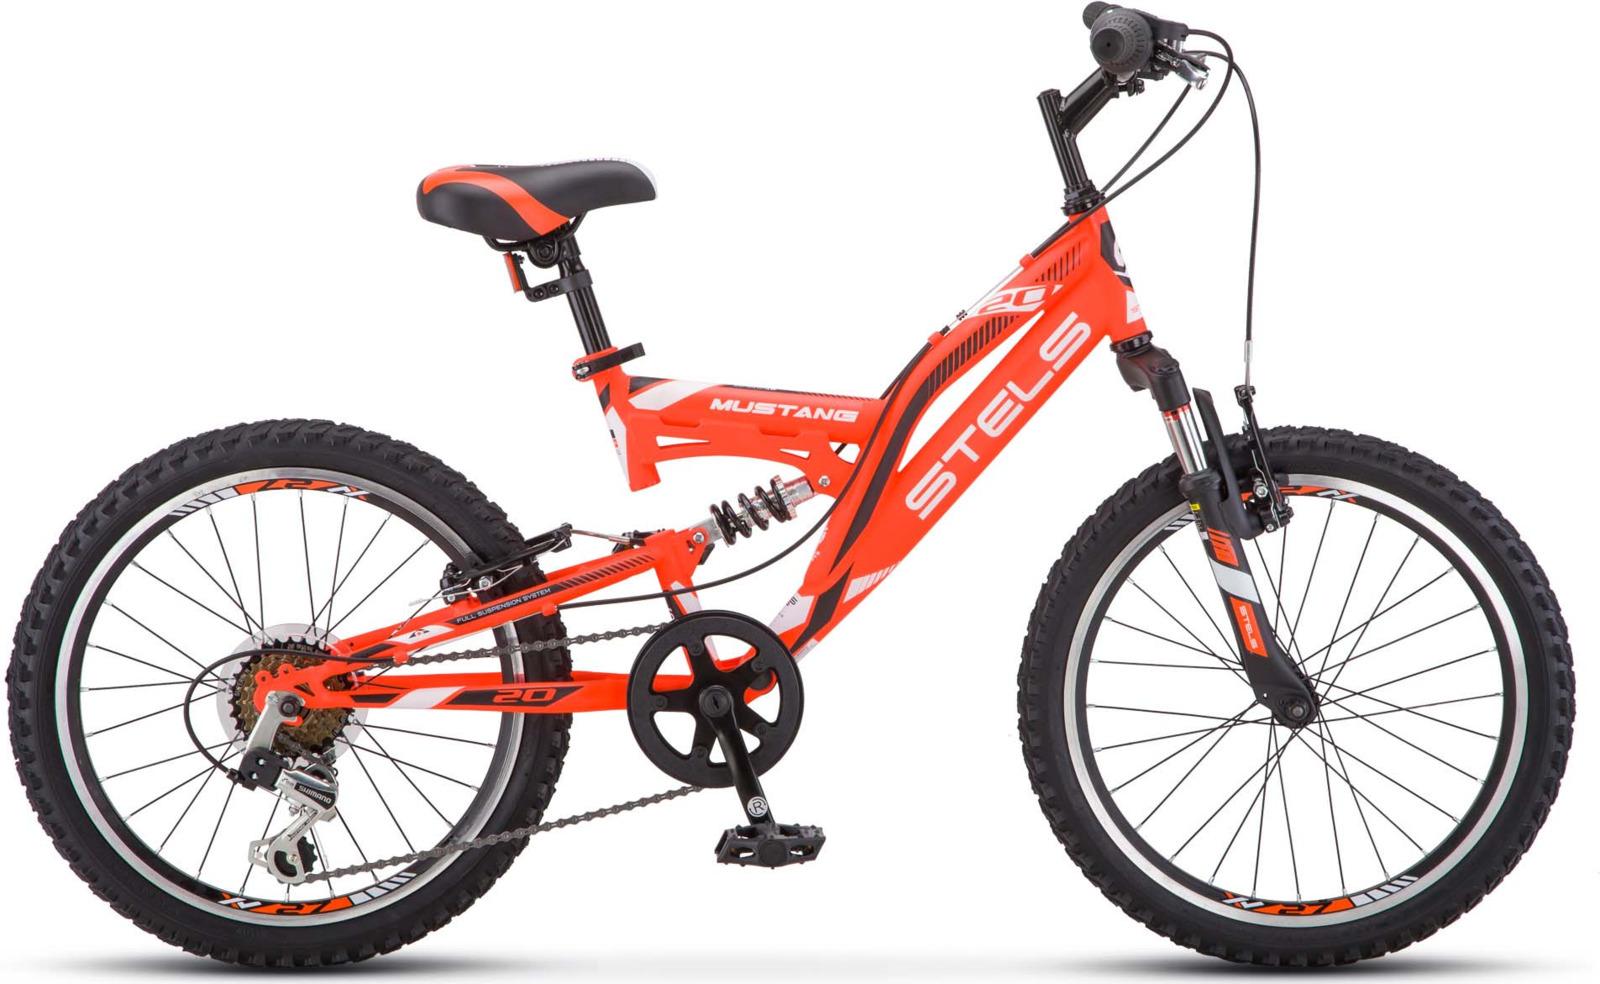 Велосипед Stels Mustang V 13, KUBC0049792018, красный велосипед stels challenger v 2016